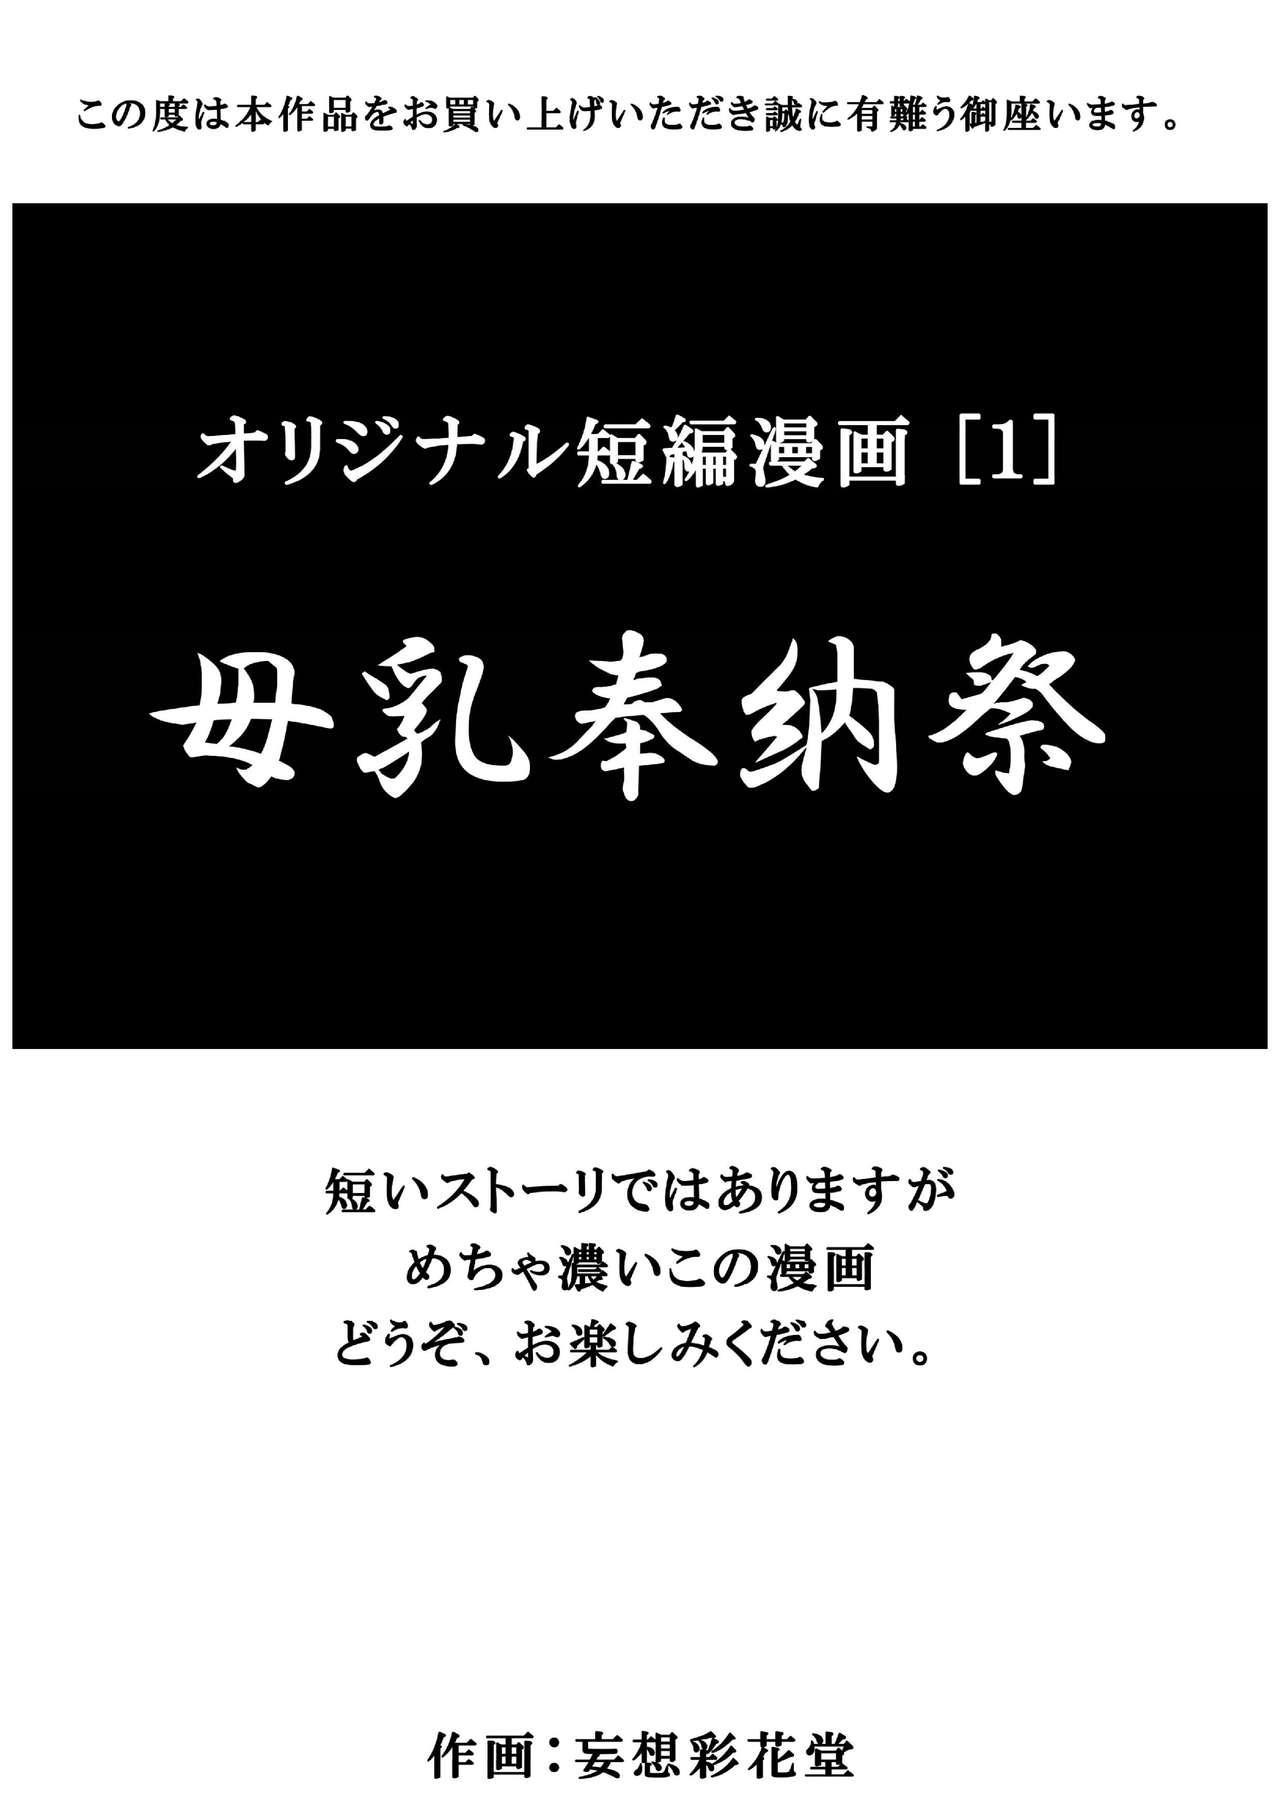 Original Tanpen Manga 2 Hon Date + Original Illust 0